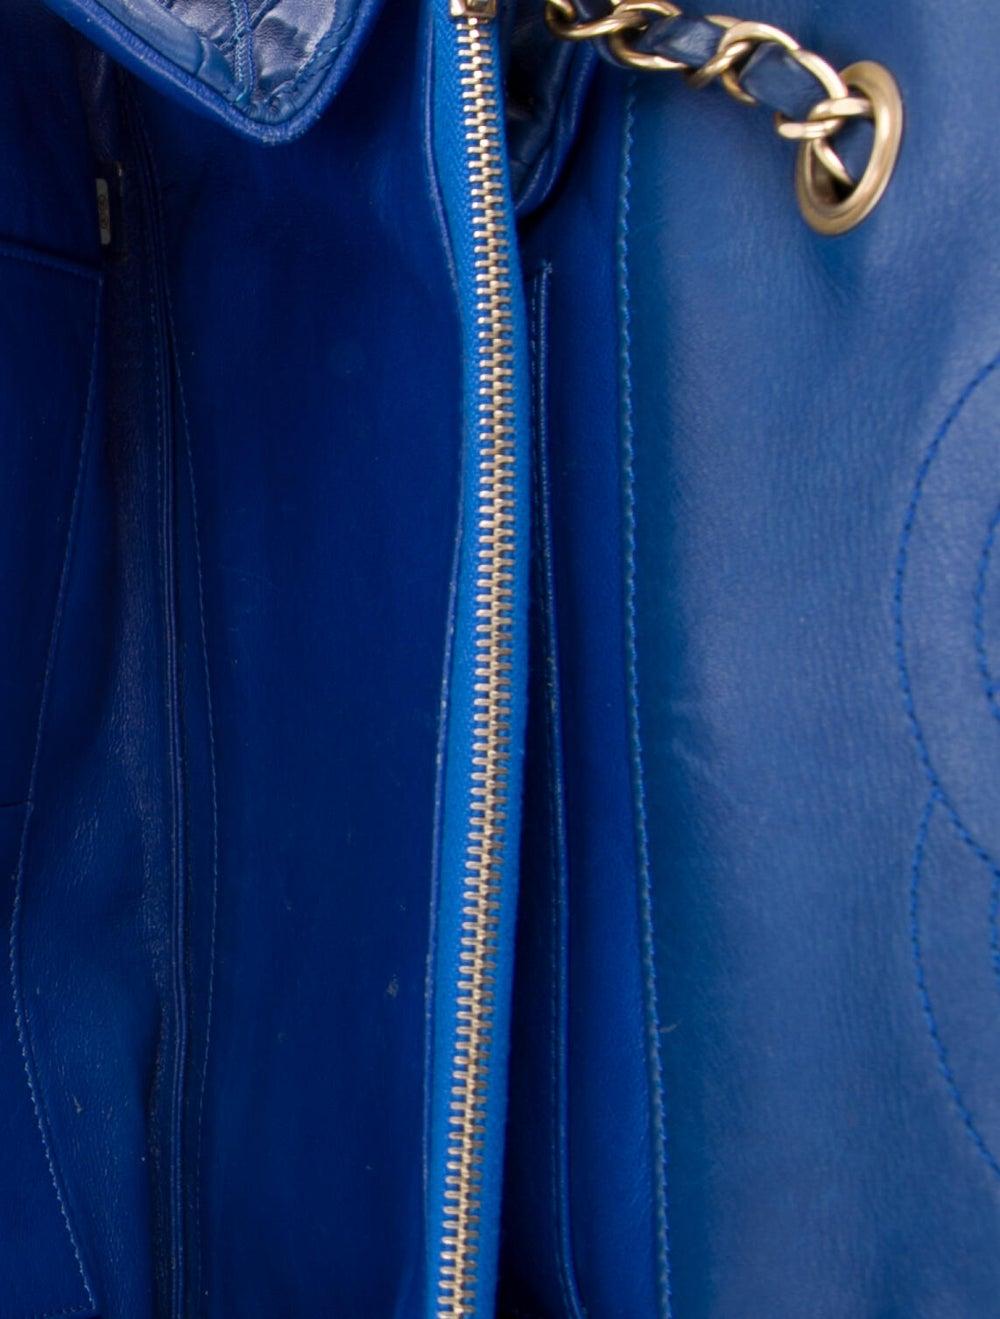 Chanel Thin City Flap Bag Blue - image 5